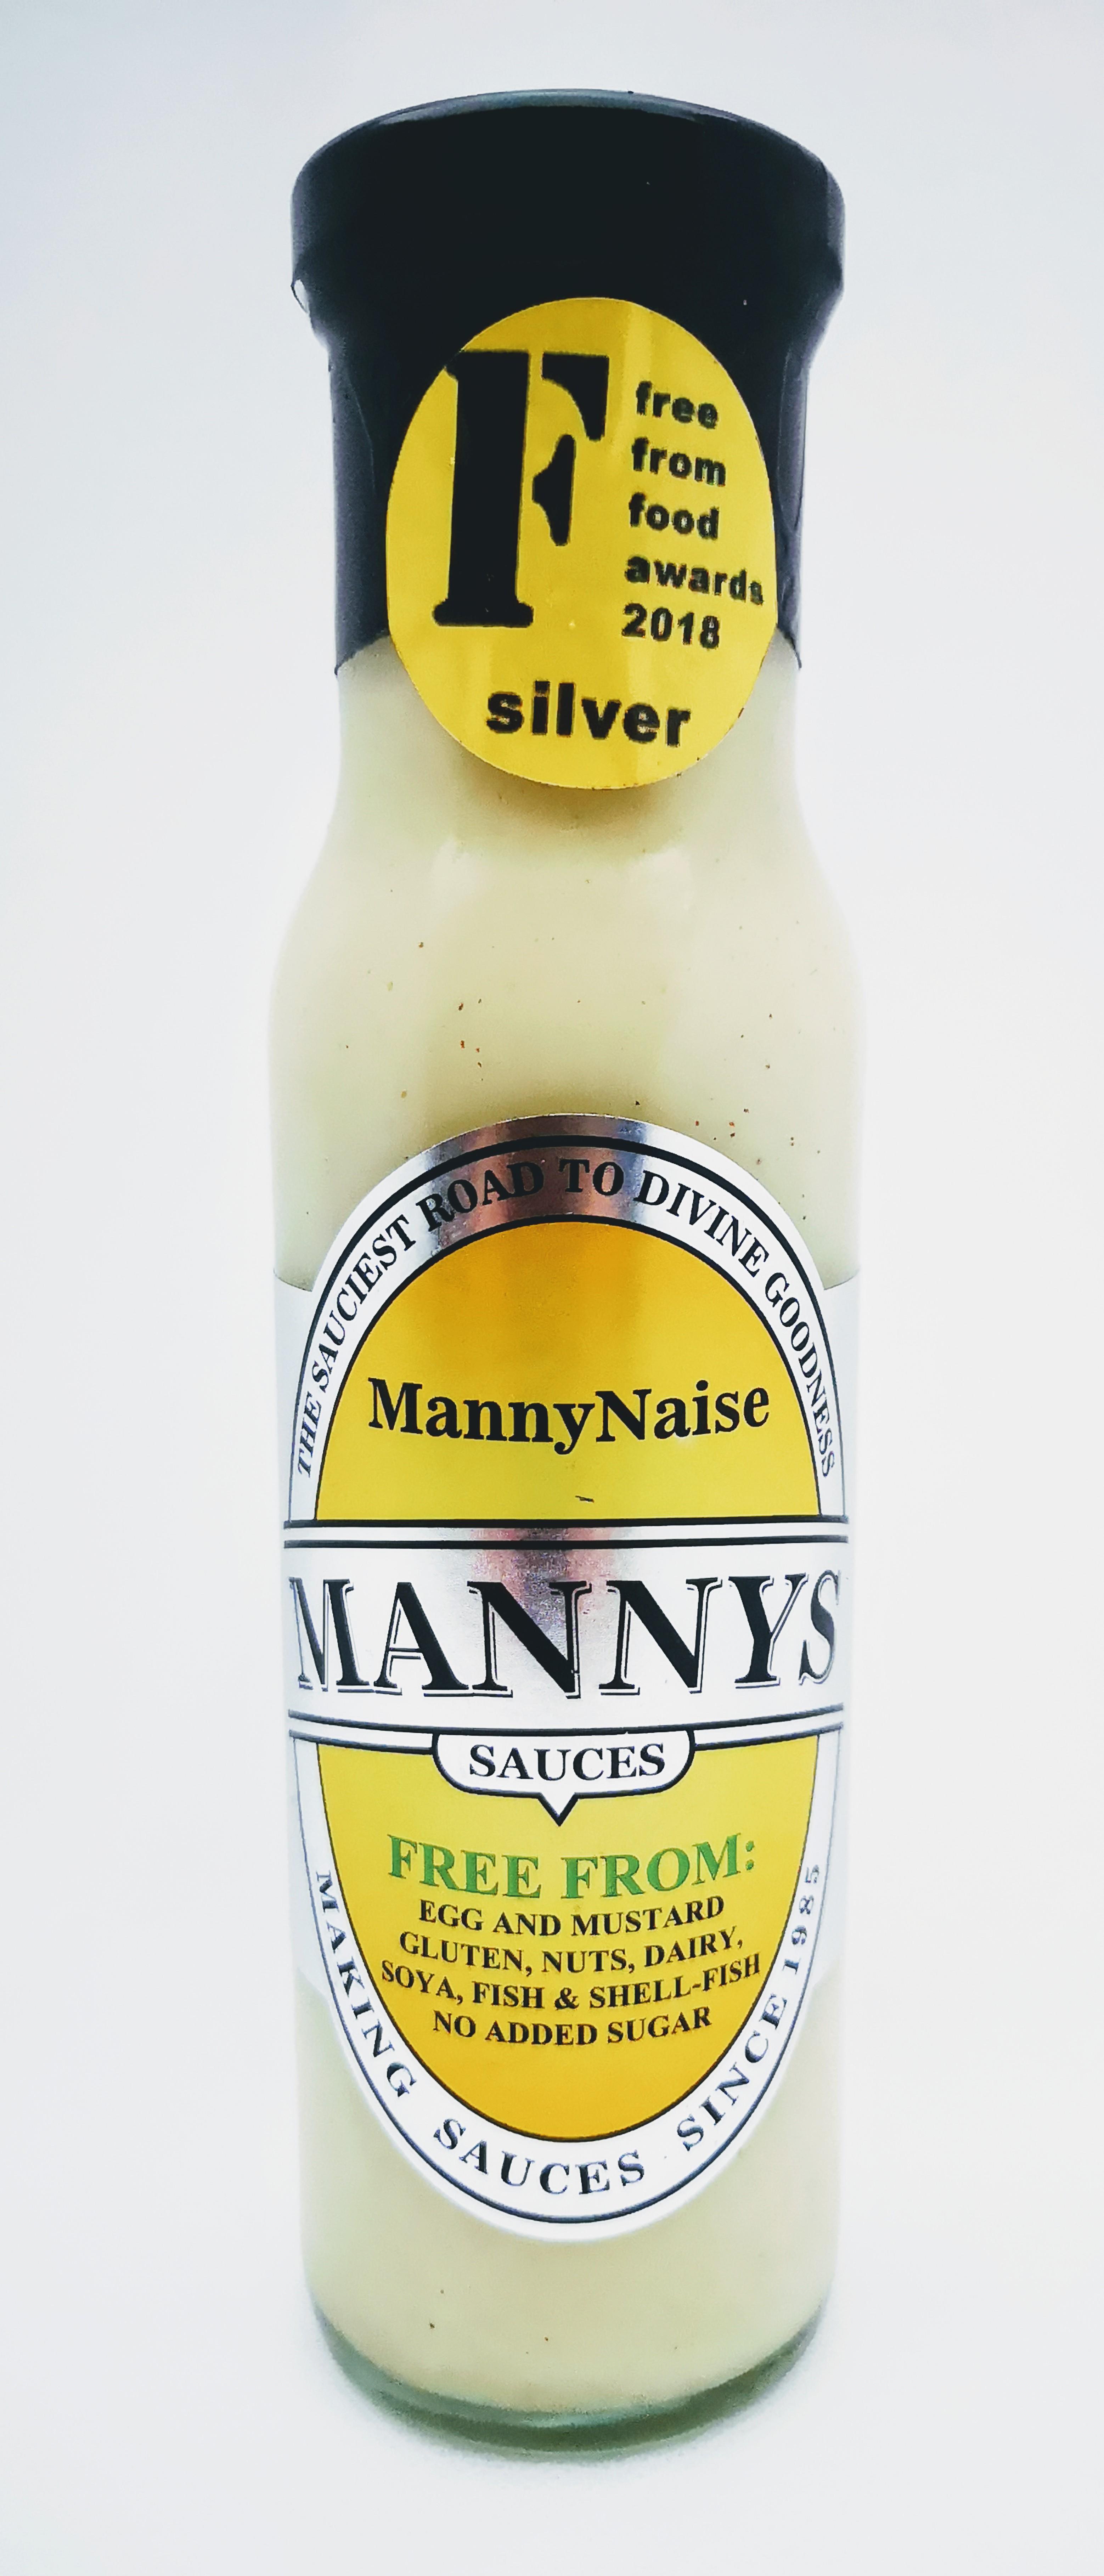 MannyNaise